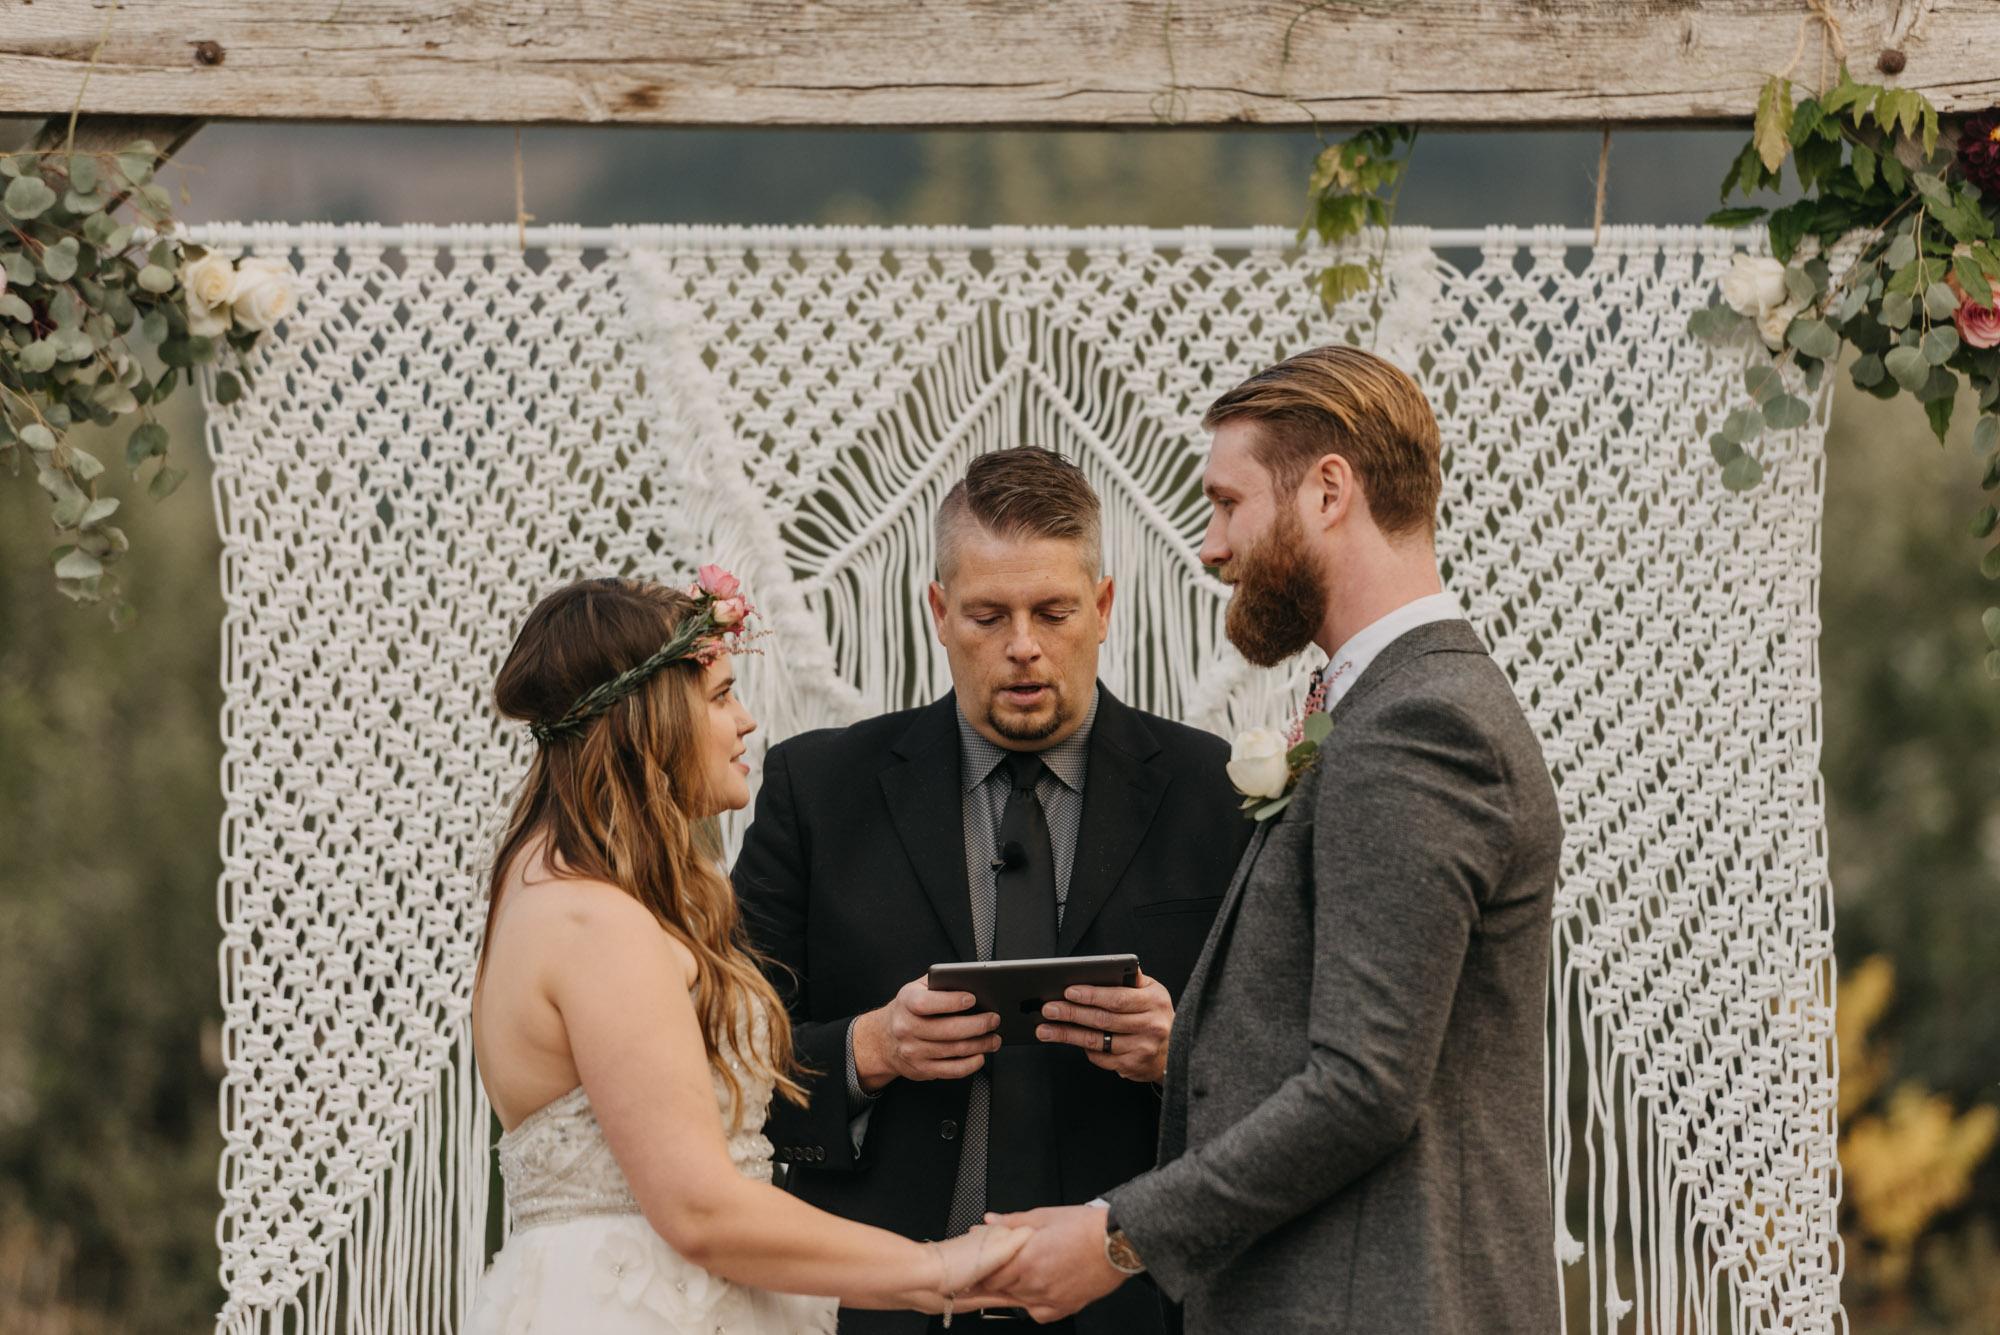 Outdoor-Summer-Ceremony-Washington-Wedding-Rainbow-9036.jpg